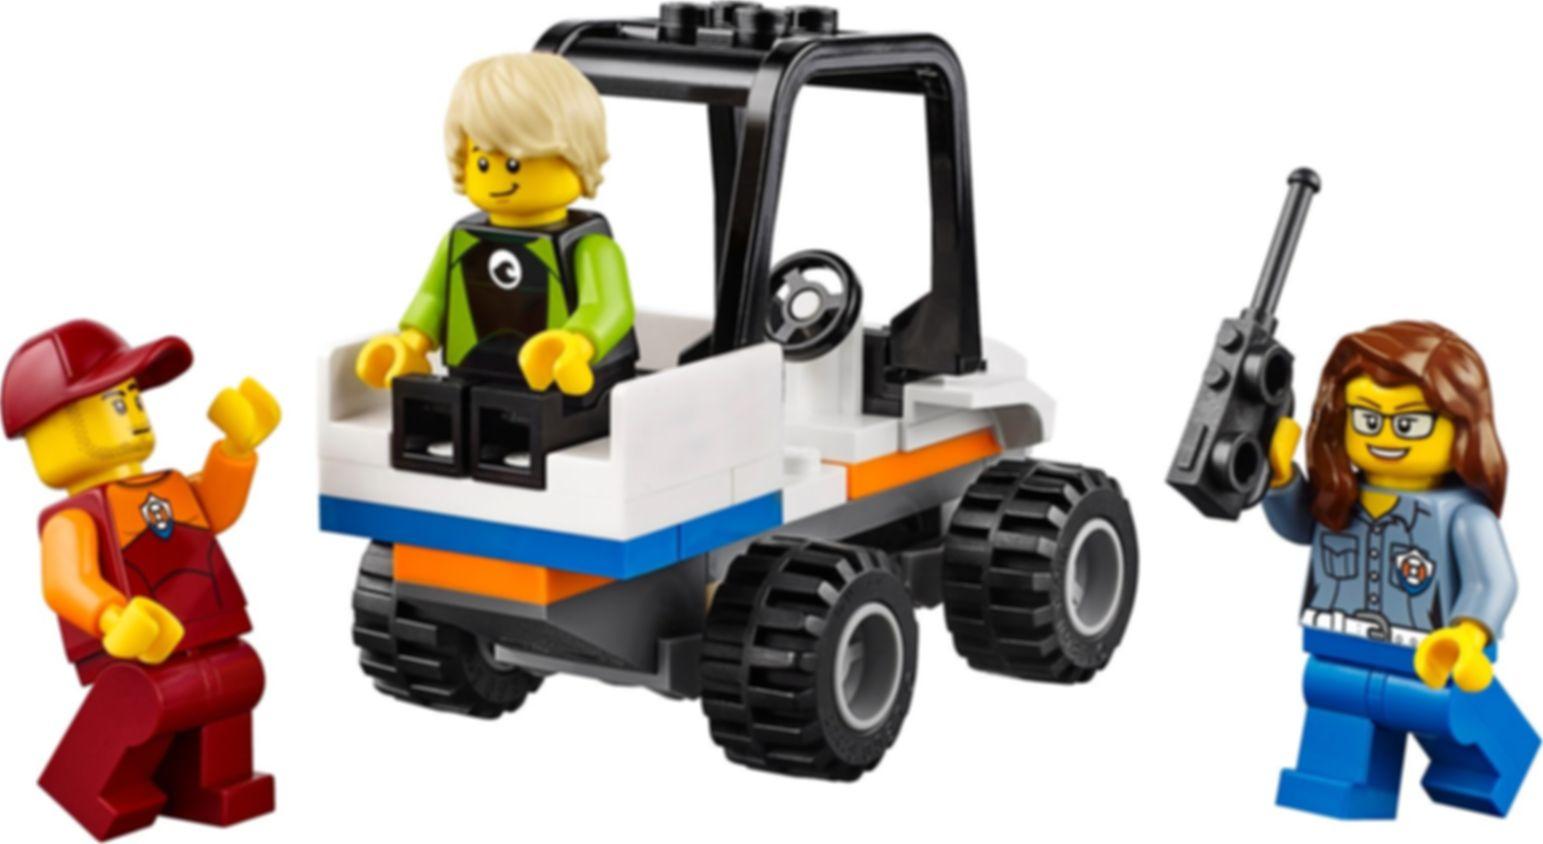 LEGO® City Coast Guard Starter Set gameplay